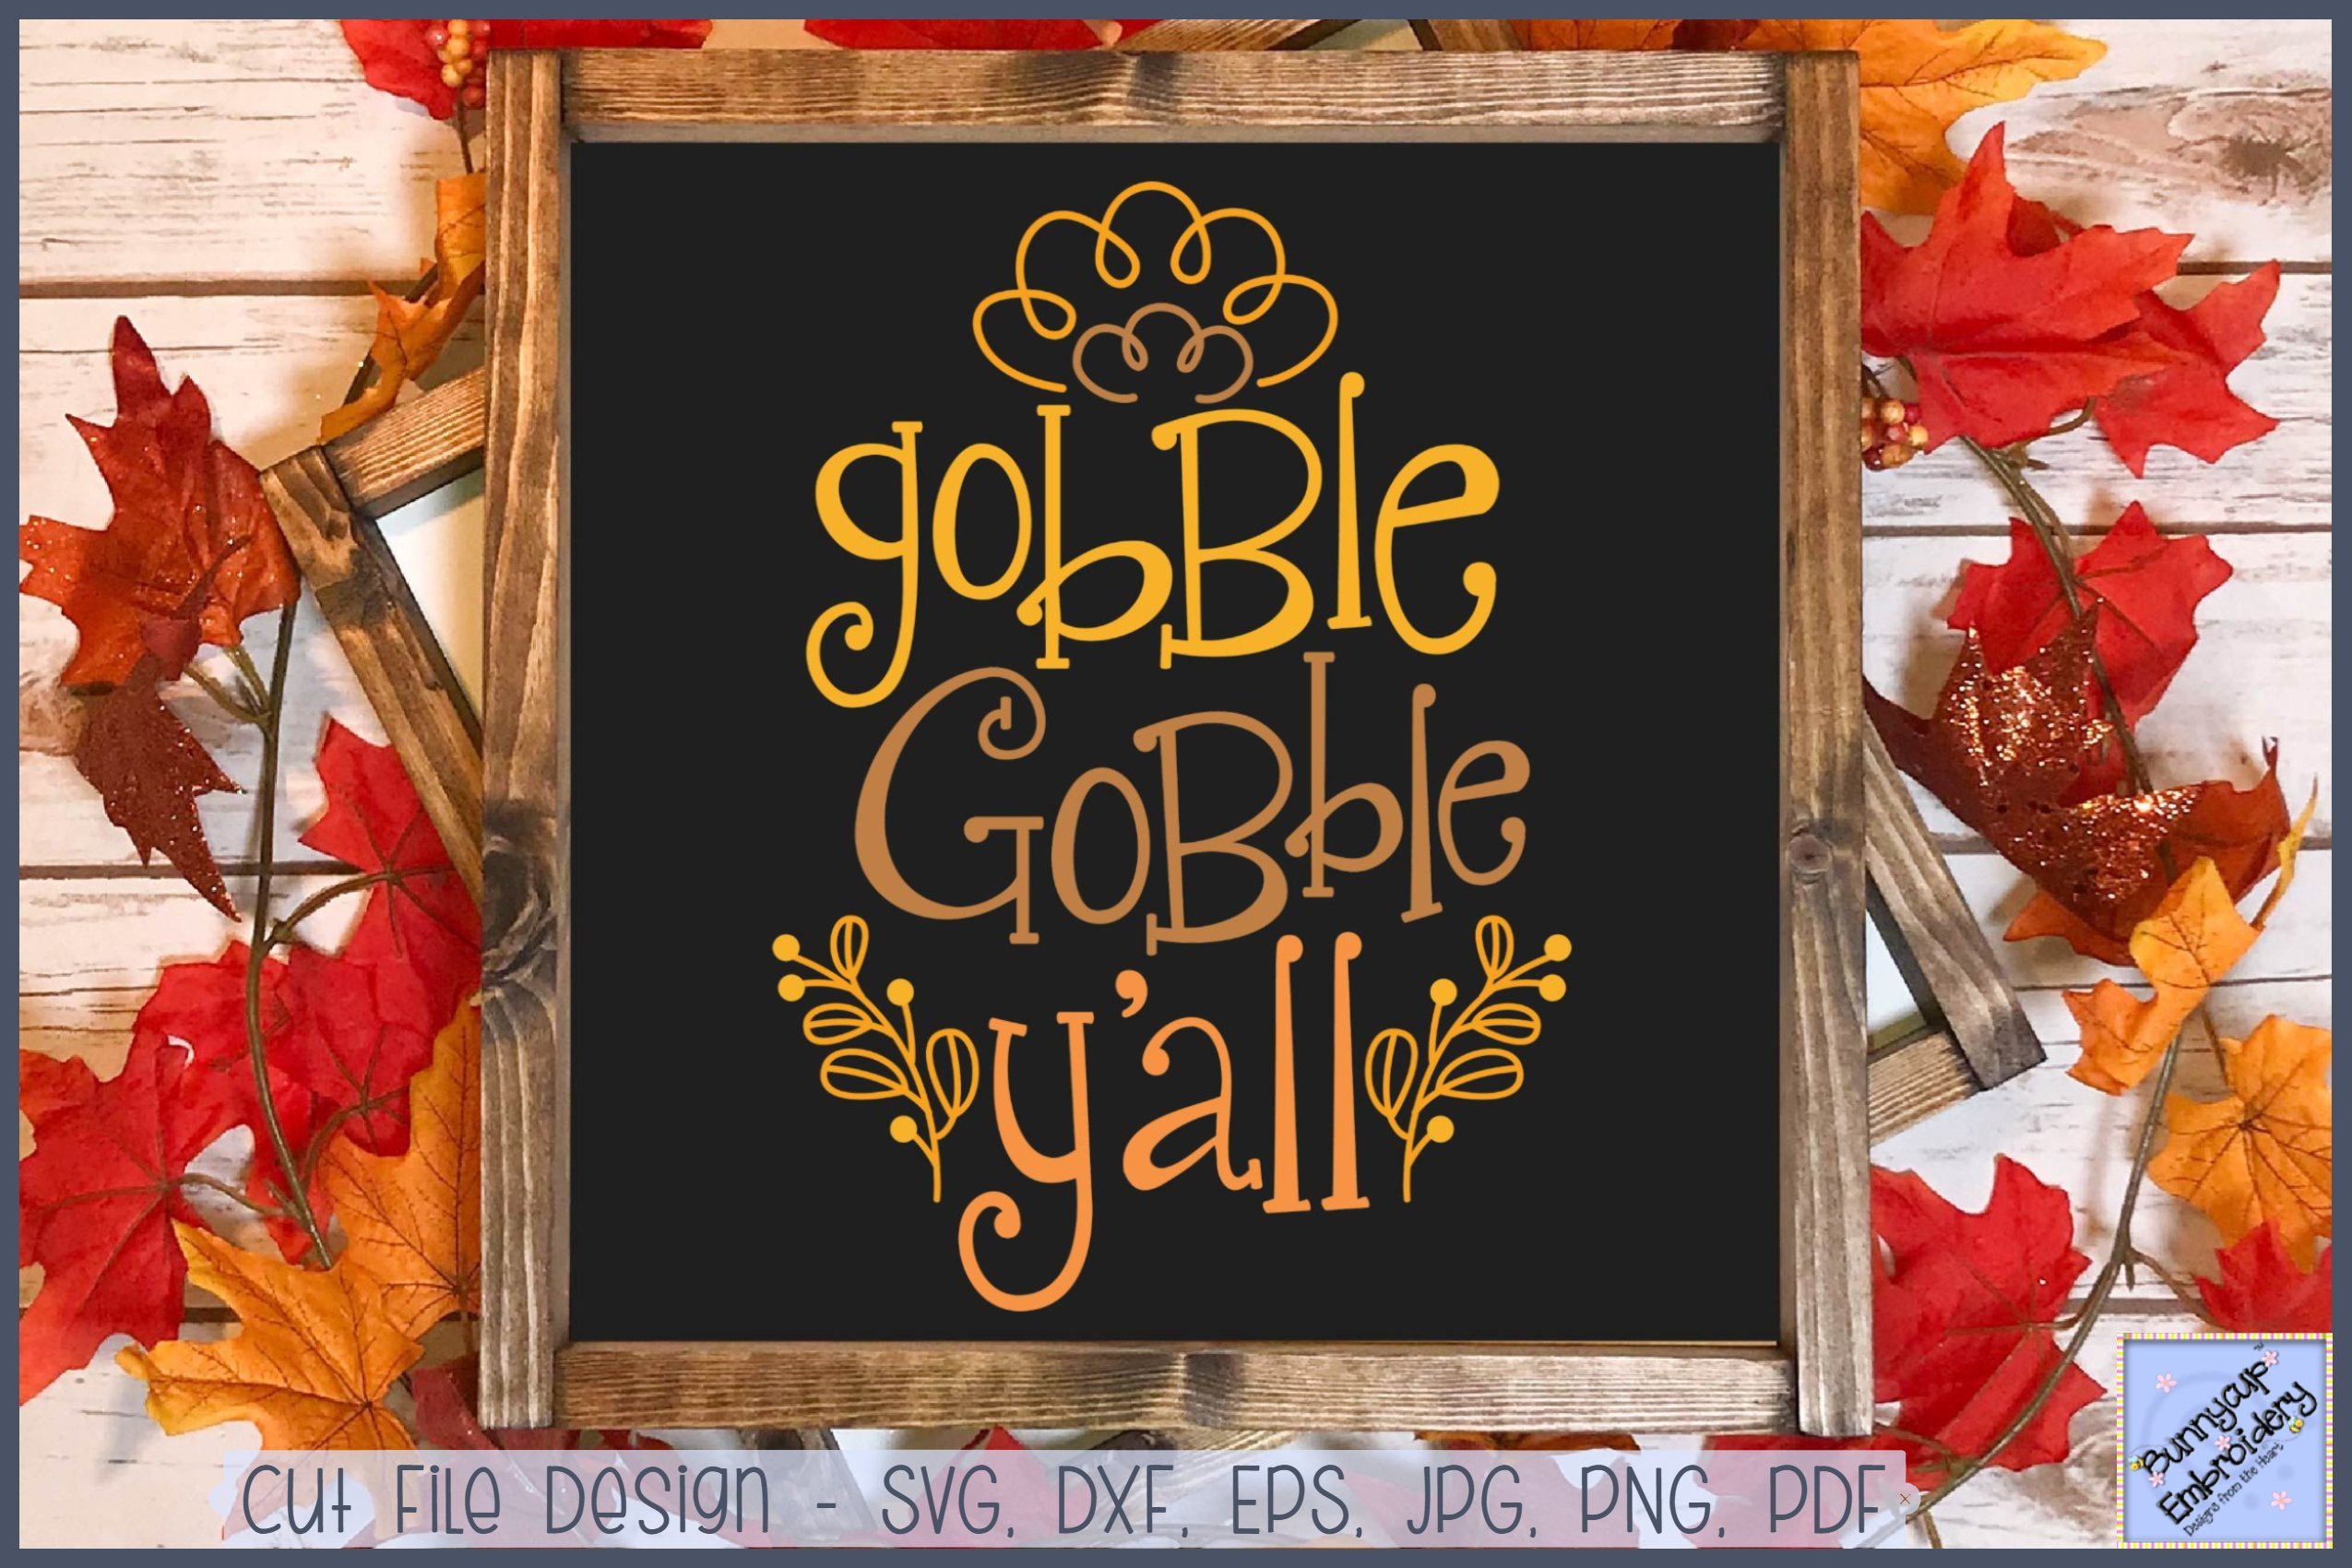 Gobble Gobble Y All Svg Clipart Printable 363382 Cut Files Design Bundles